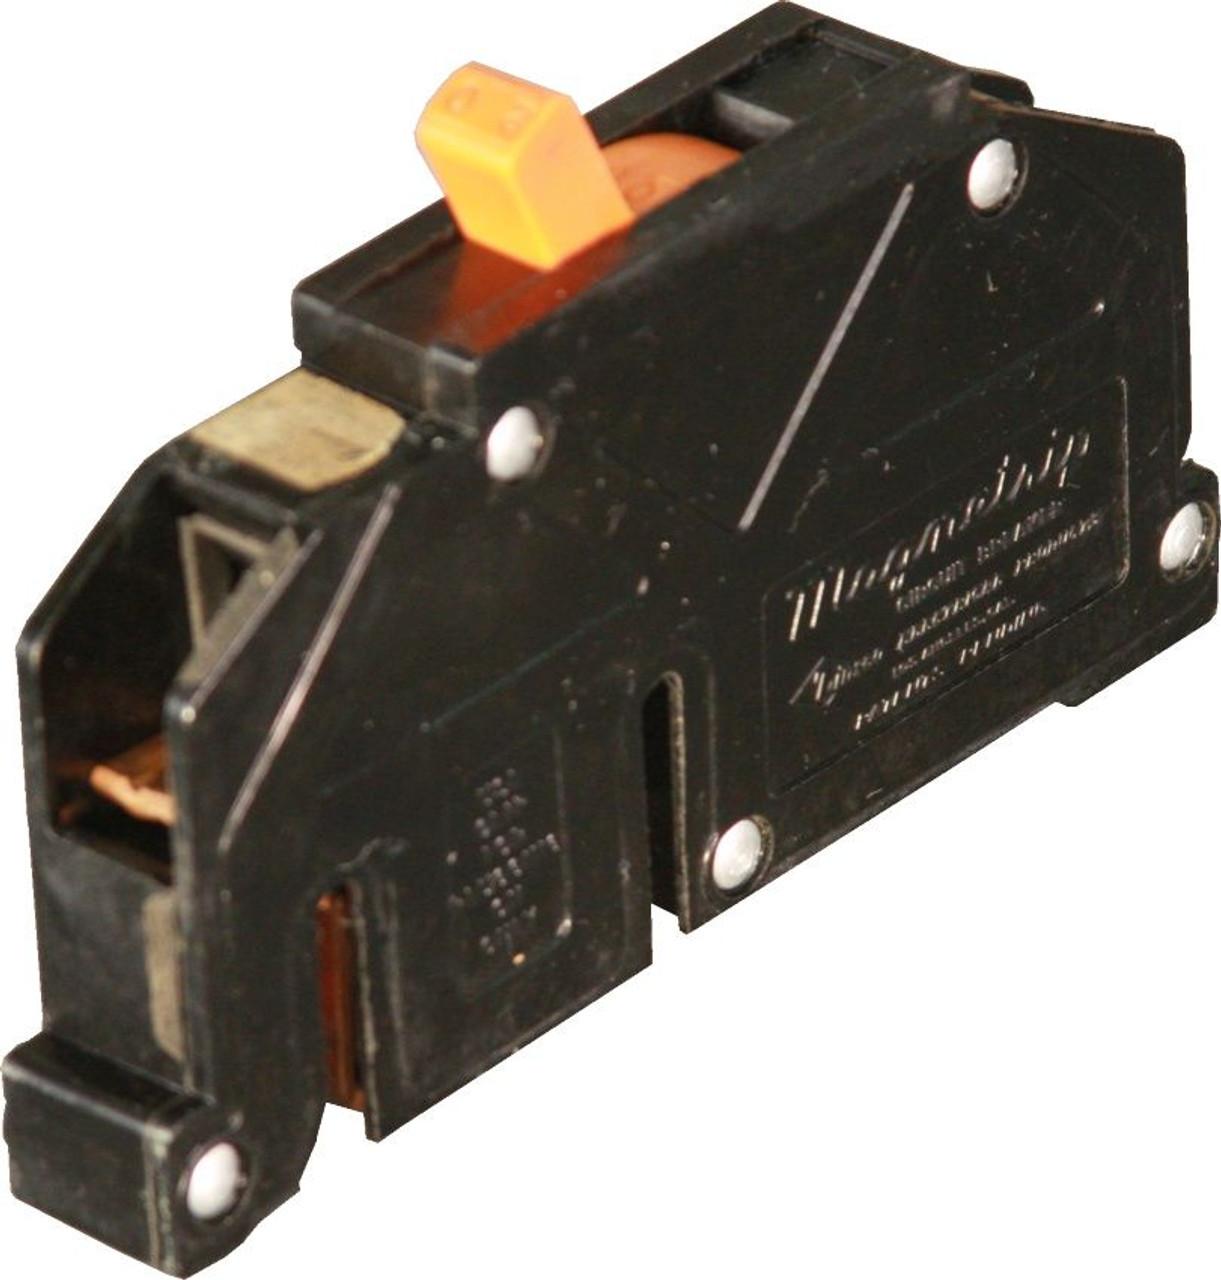 Q-50 Zinsco Circuit Breaker